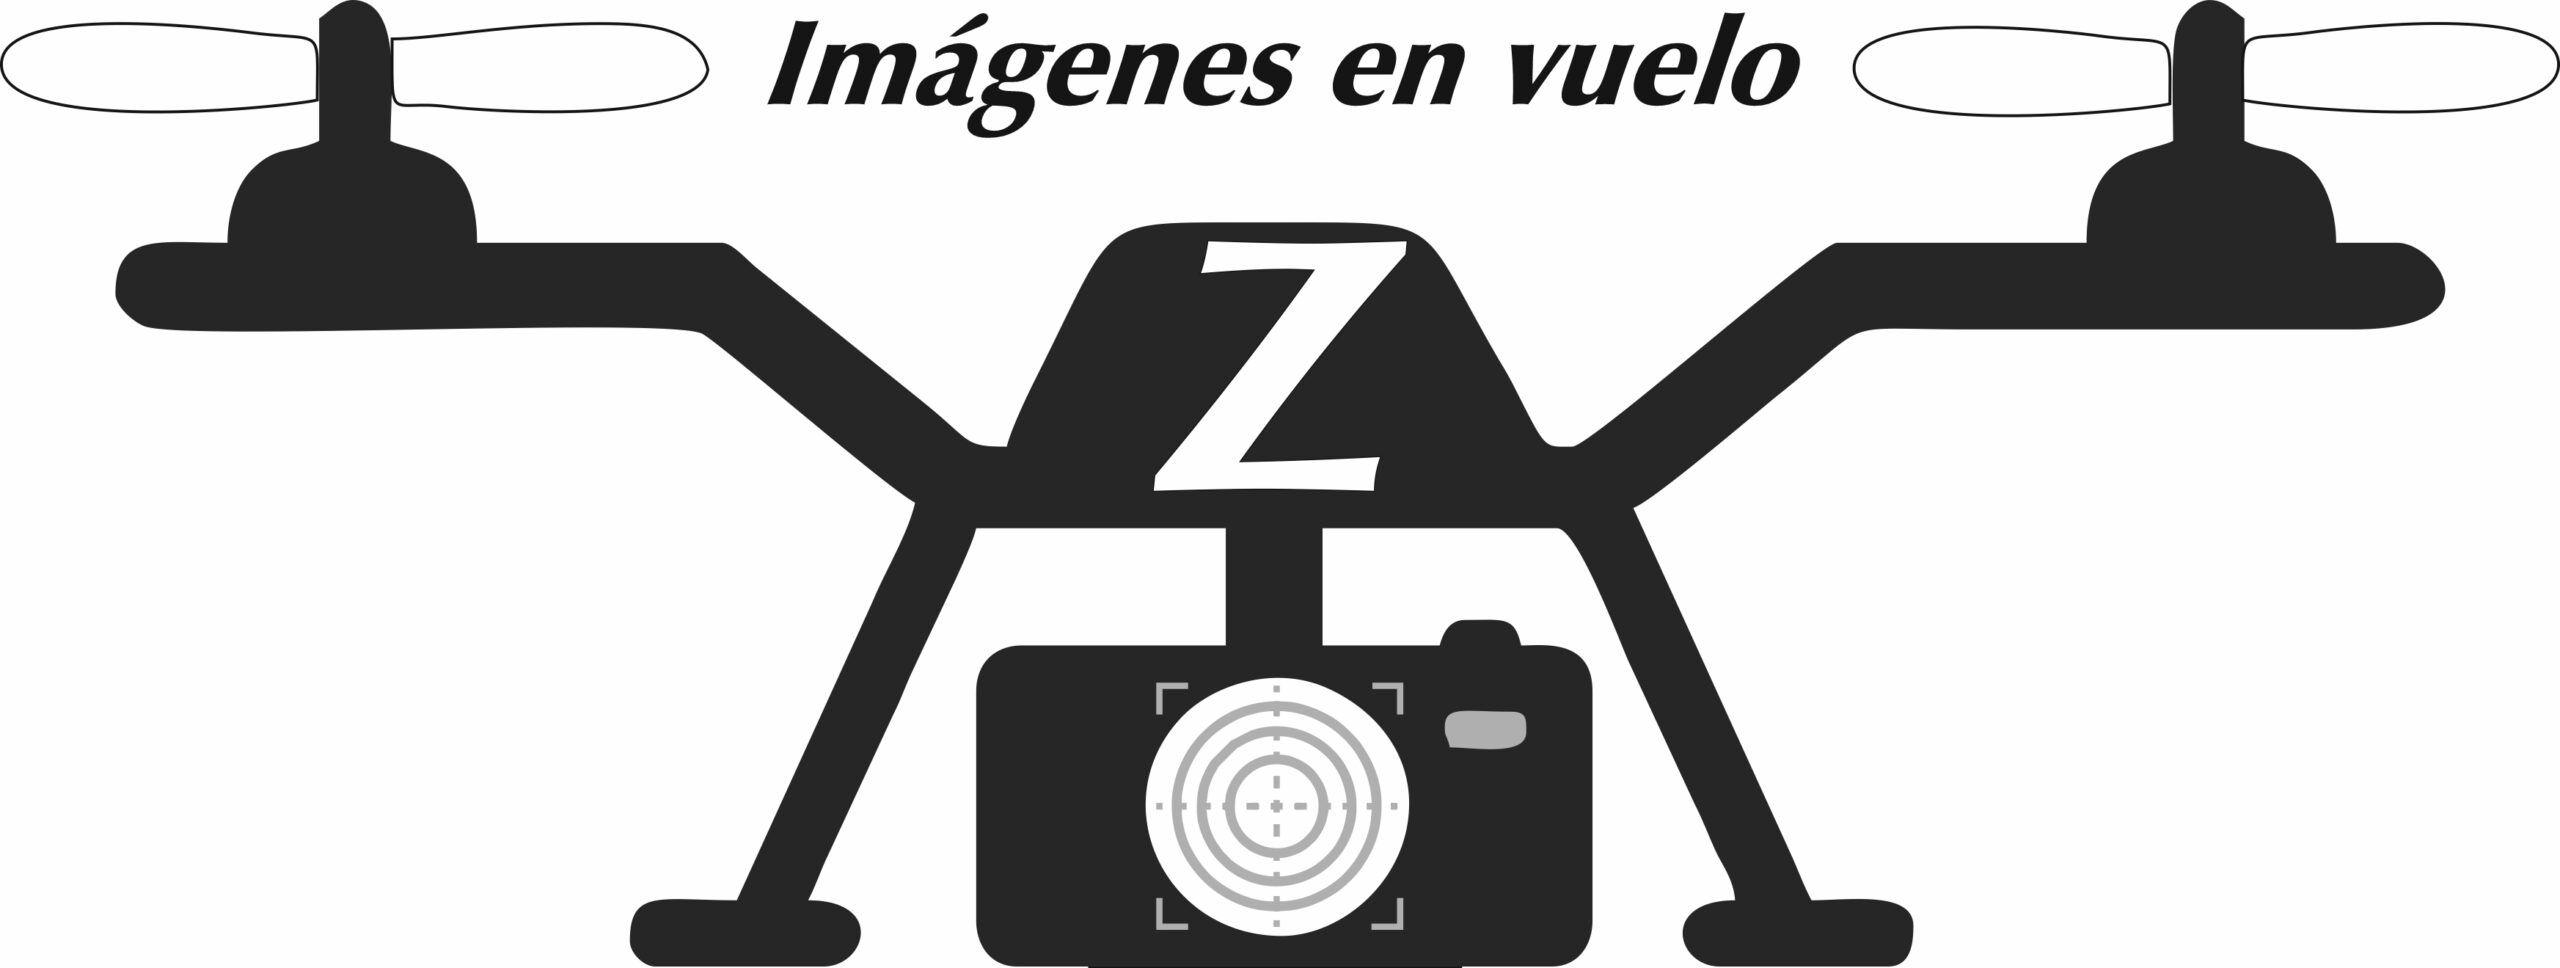 Dron imagenes